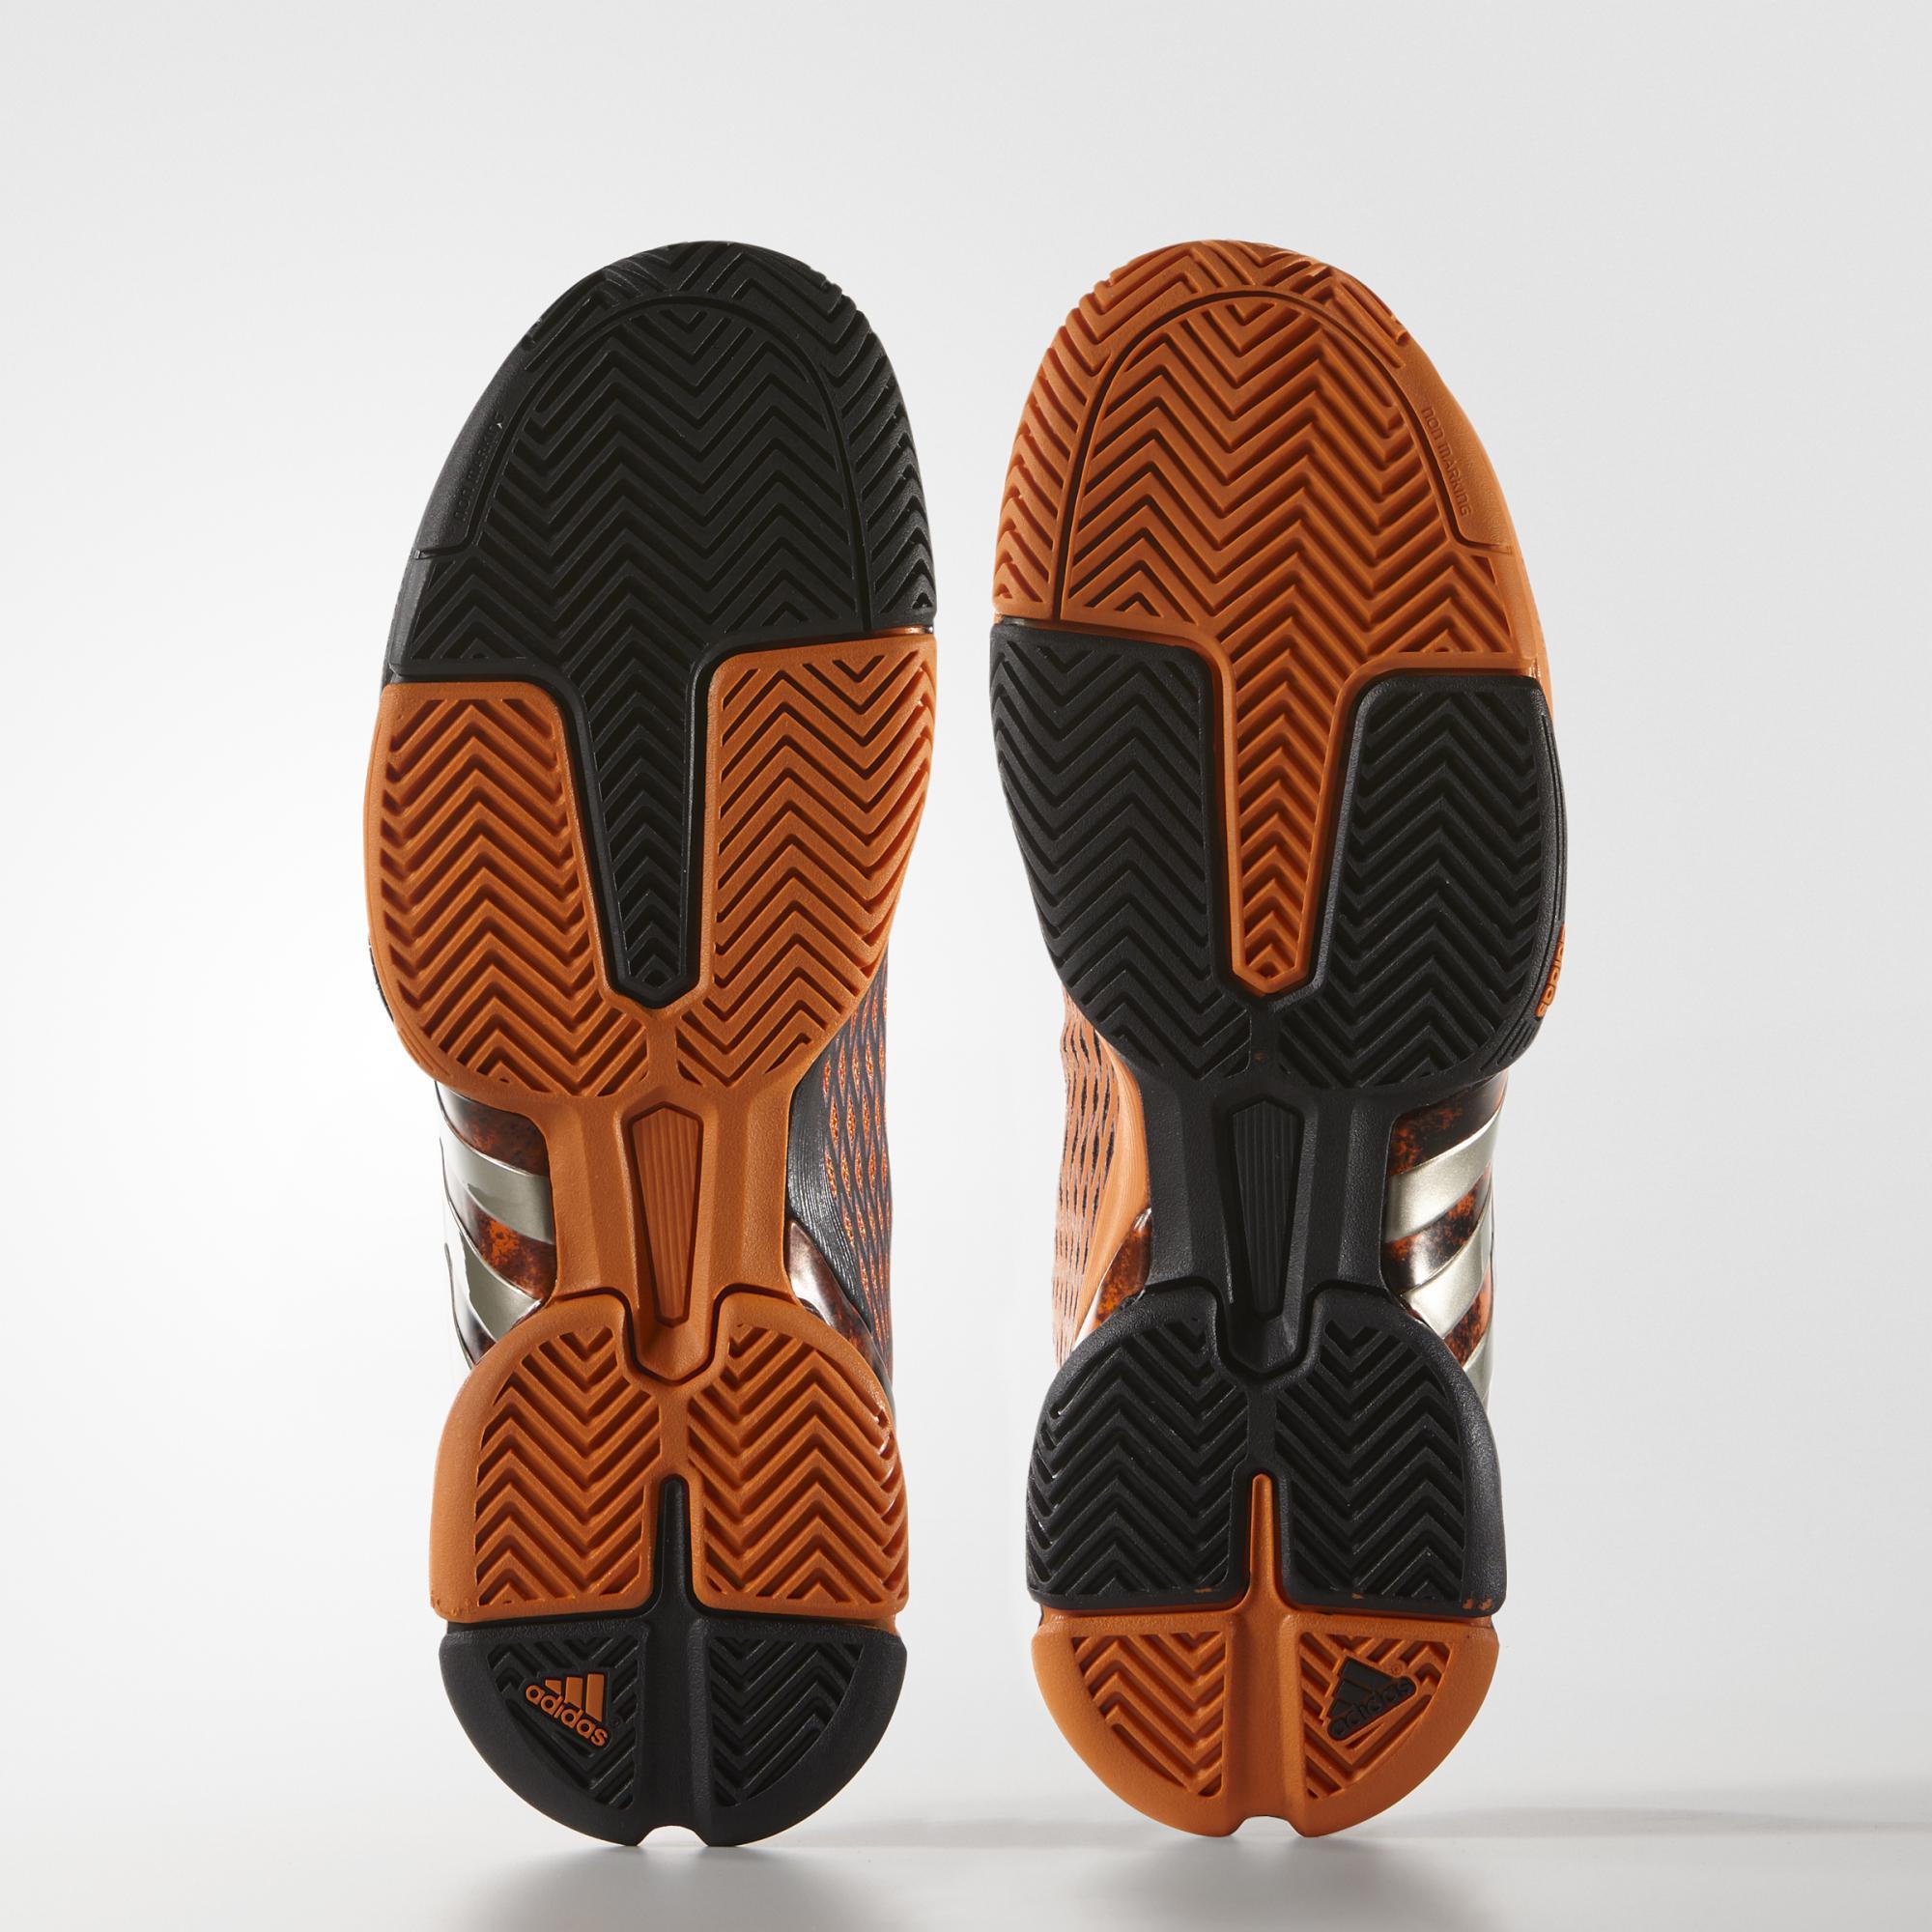 918f9a8f2 Adidas Mens Barricade 2016 Alexander Tennis Shoes - Orange Black ...